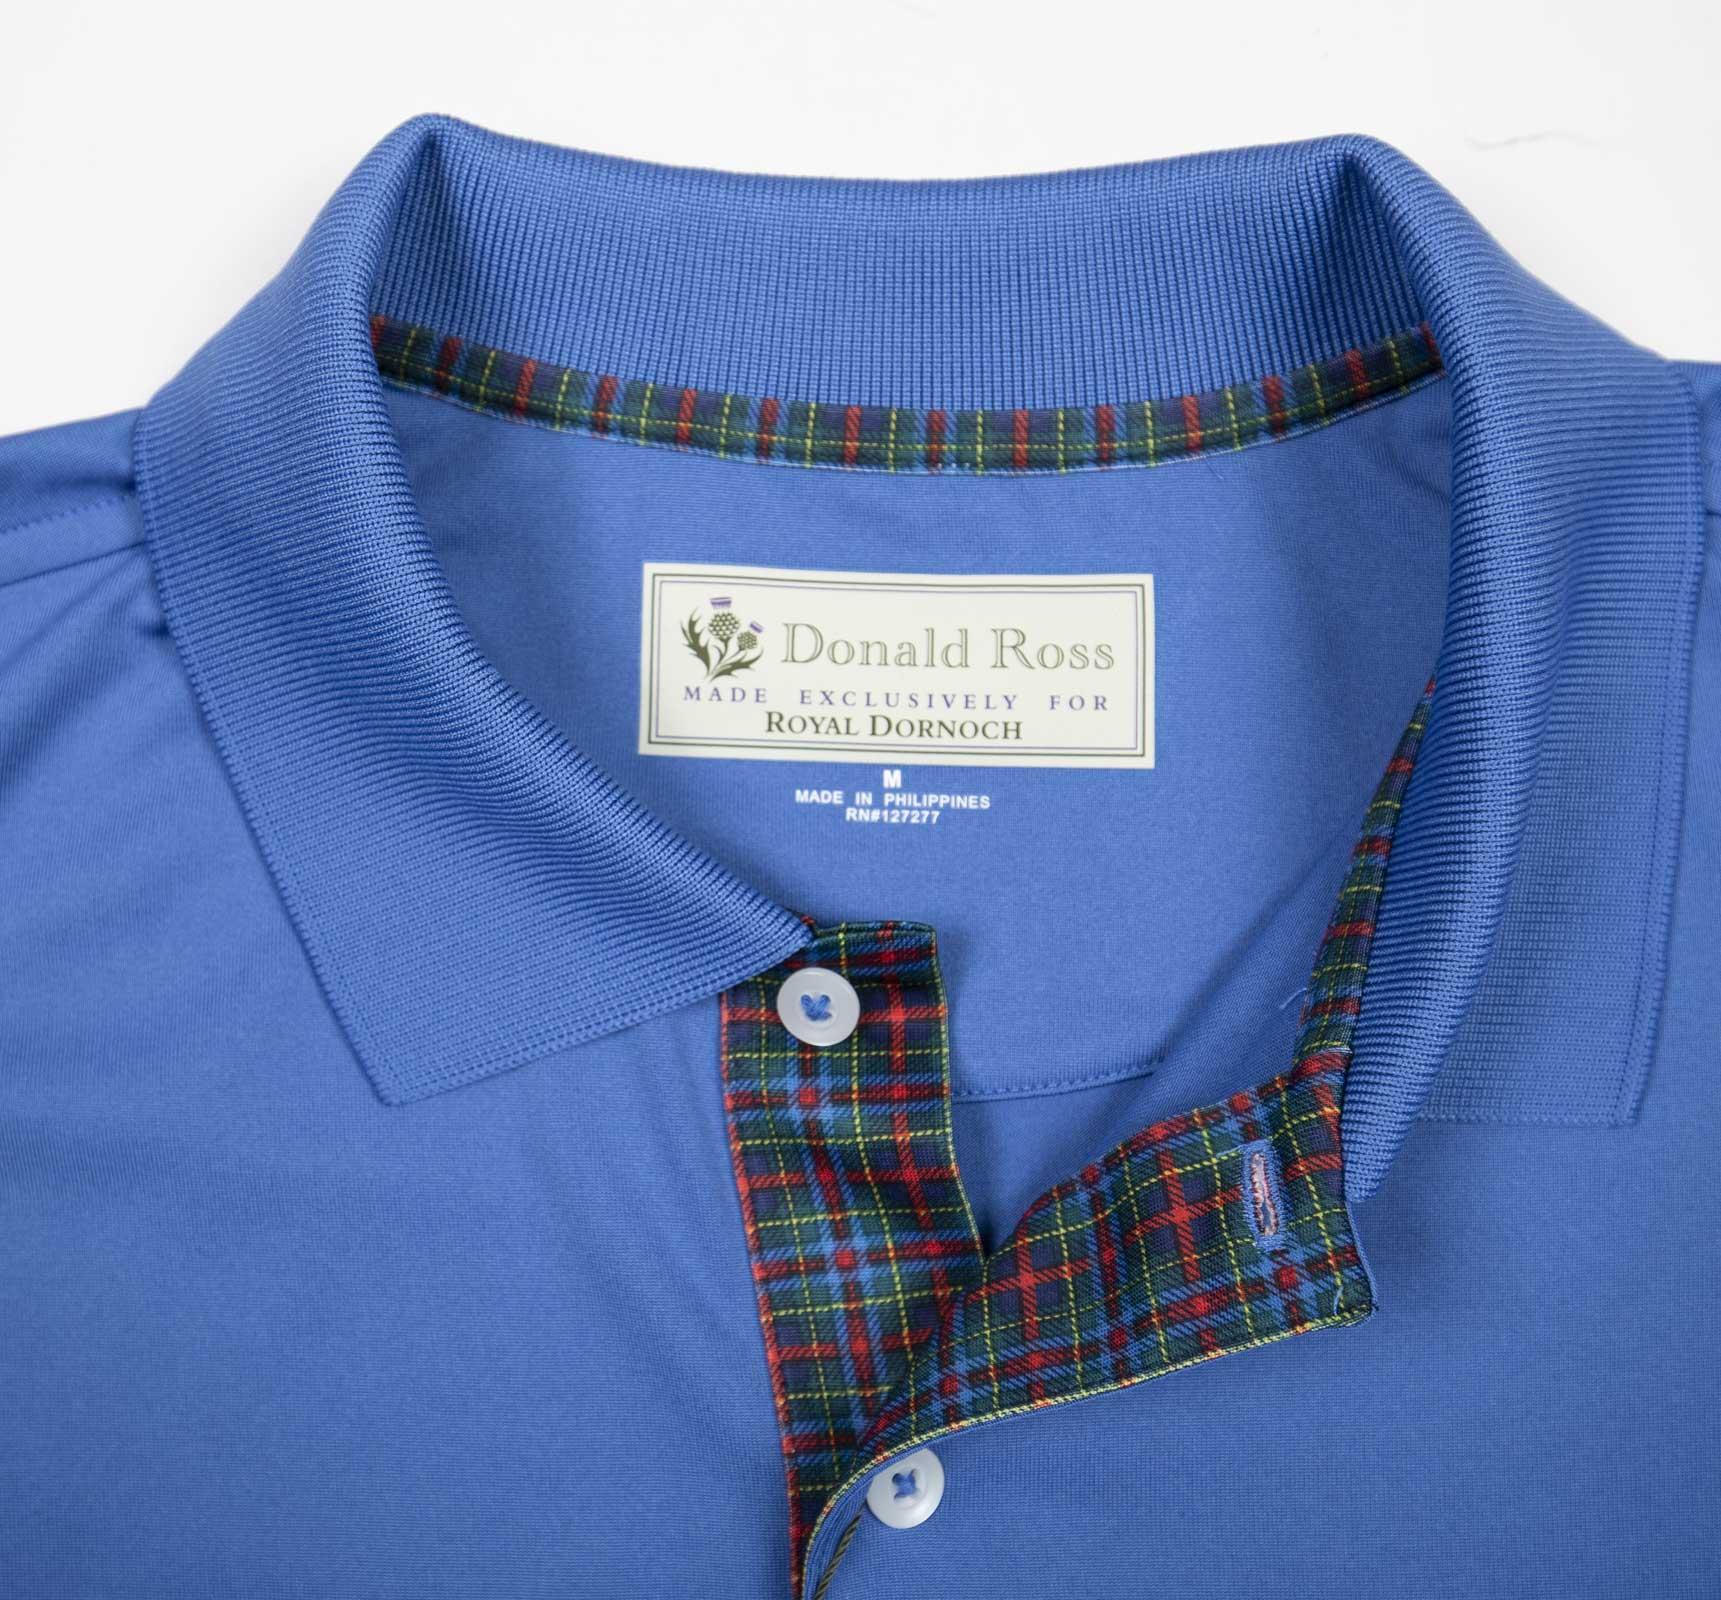 Car Battery Size Chart >> Donald Ross Solid Tartan Shirt - Royal Dornoch Pro Shop